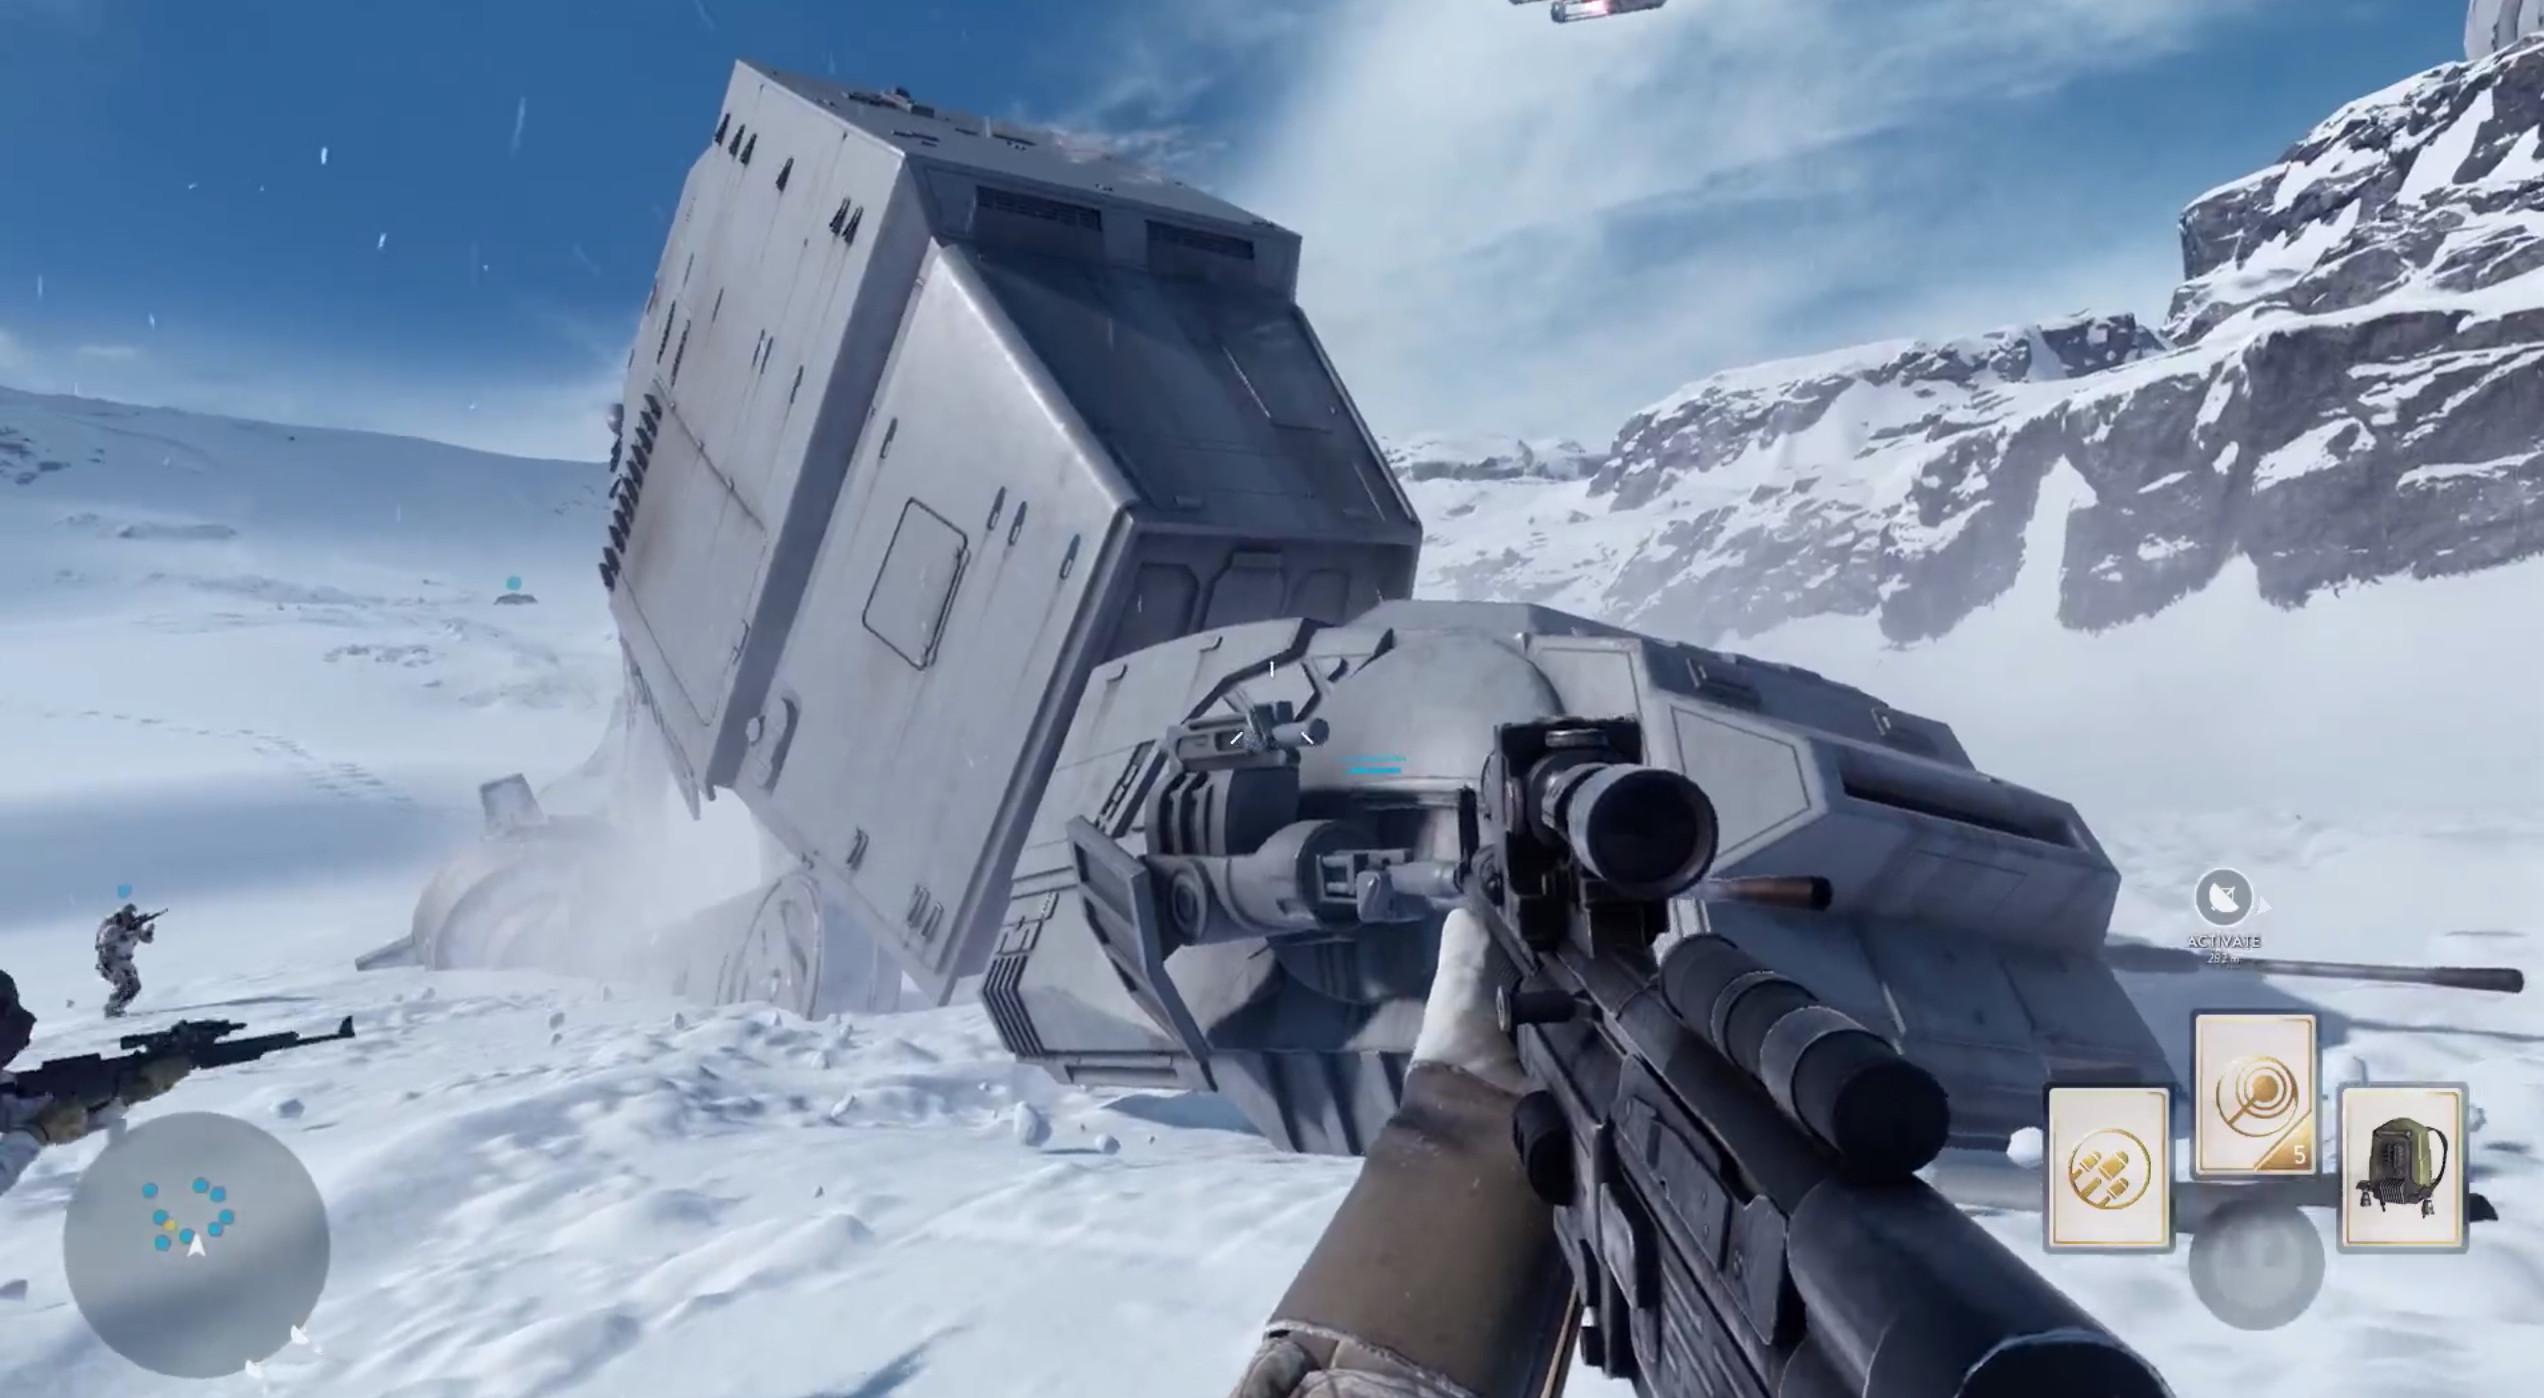 Star Wars Battlefront screengrab